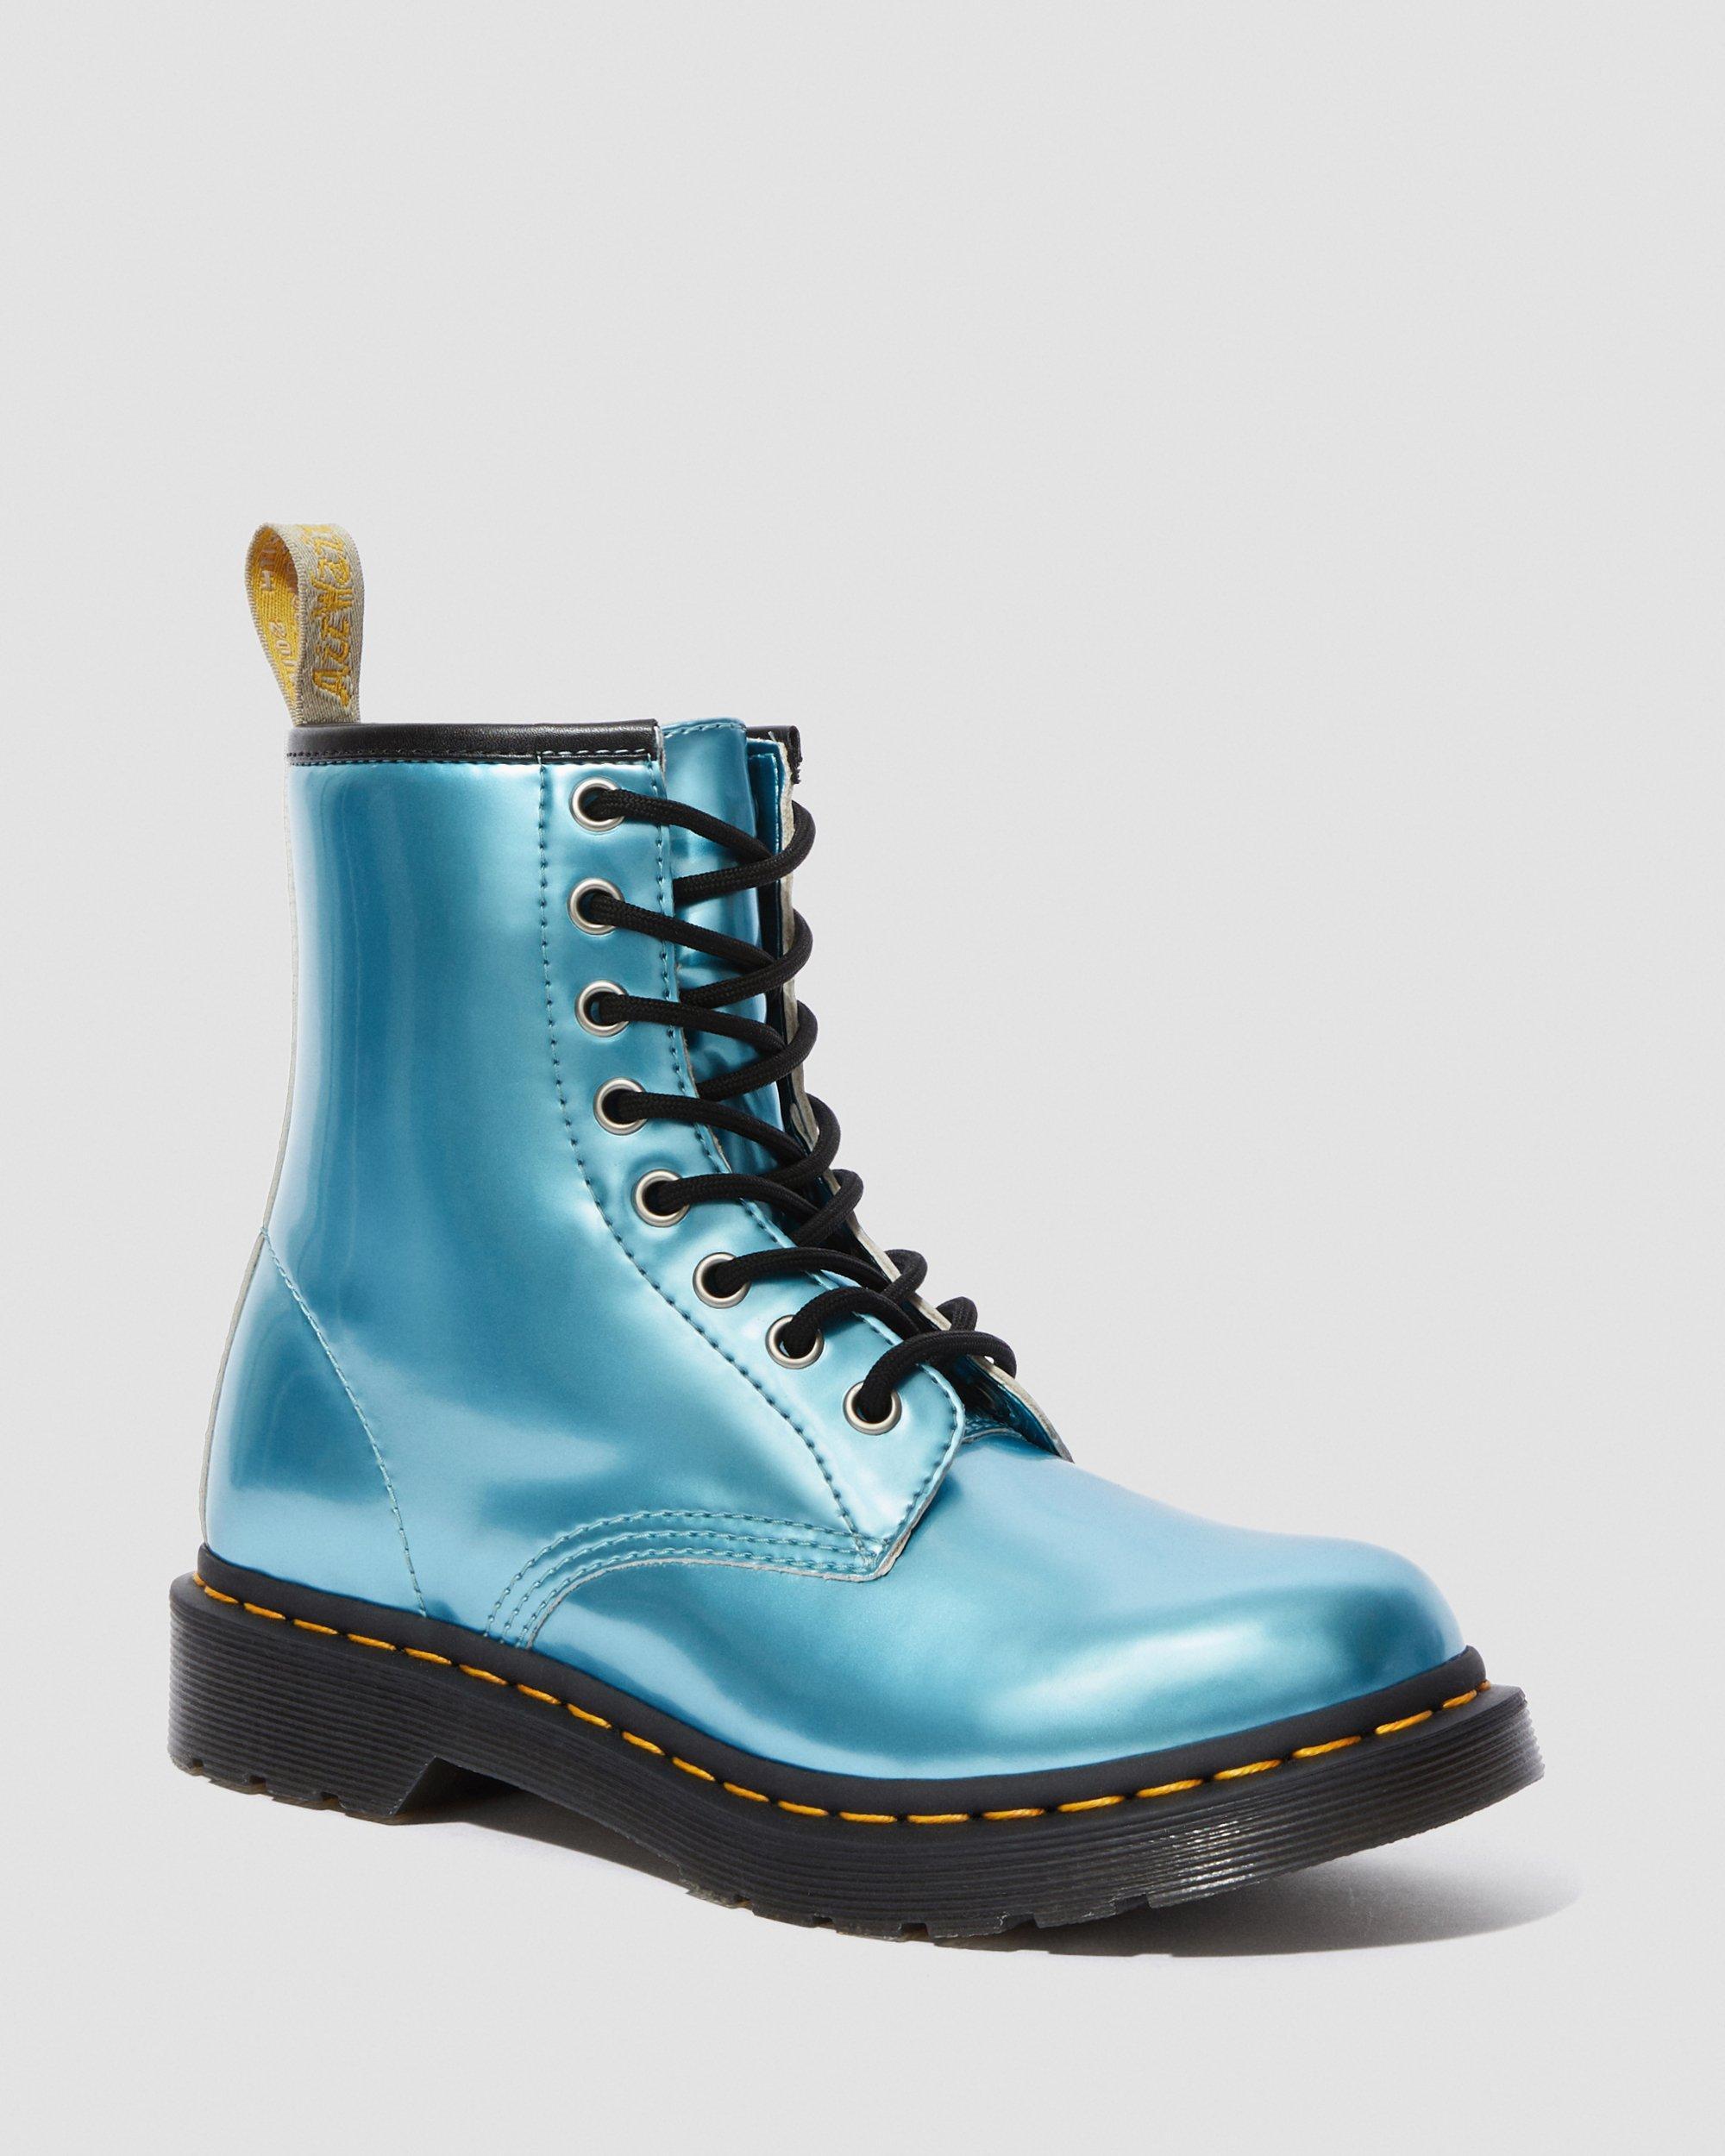 1460 STUD | 1460 Boots | Dr. Martens Official